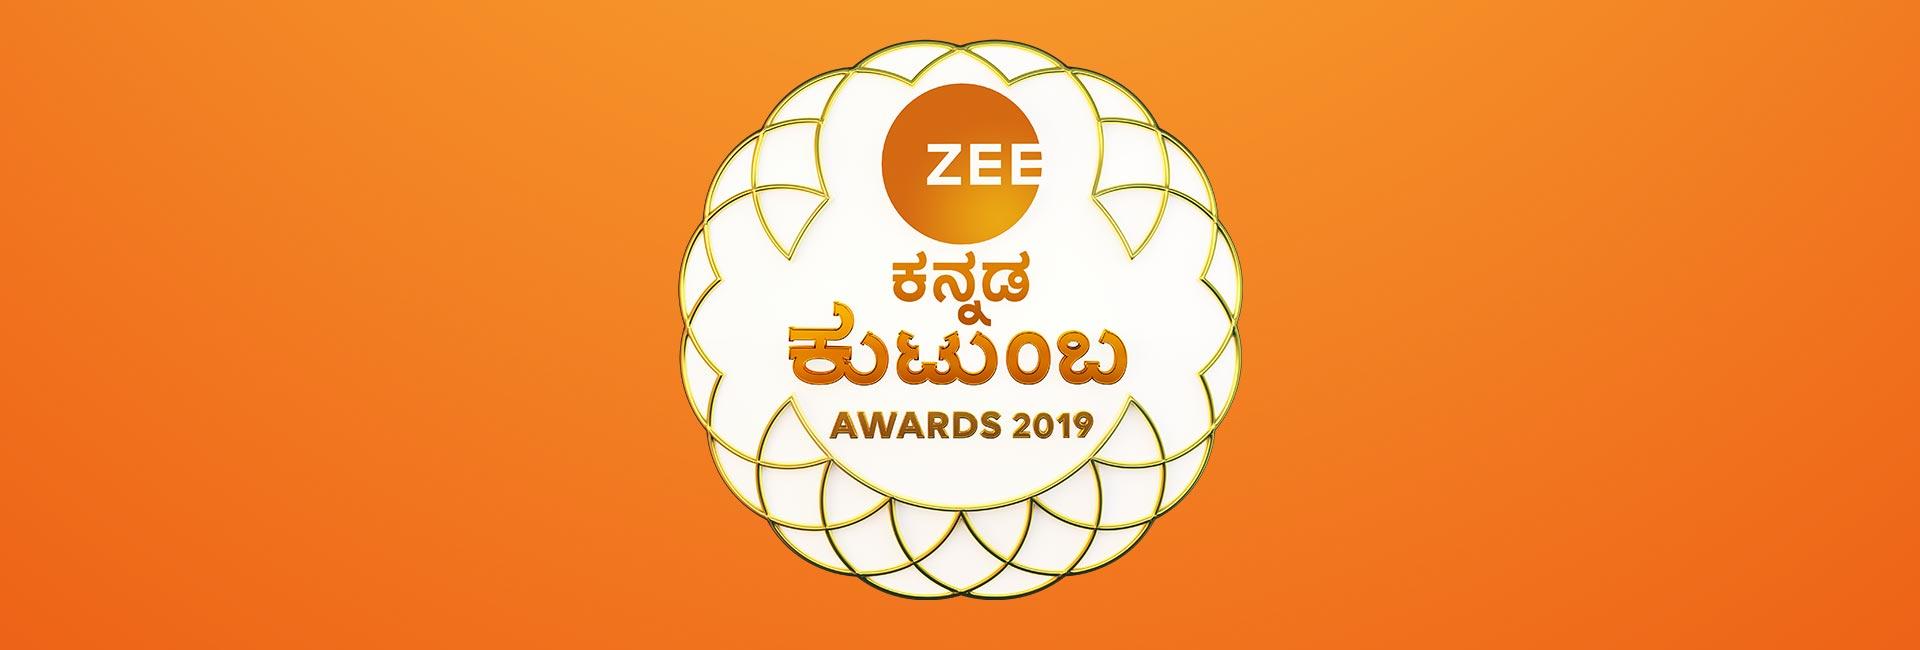 ZEE Kannada Kutumba Awards 2019 - Vote Online | ZEE Kannada Television Shows| ZEE5